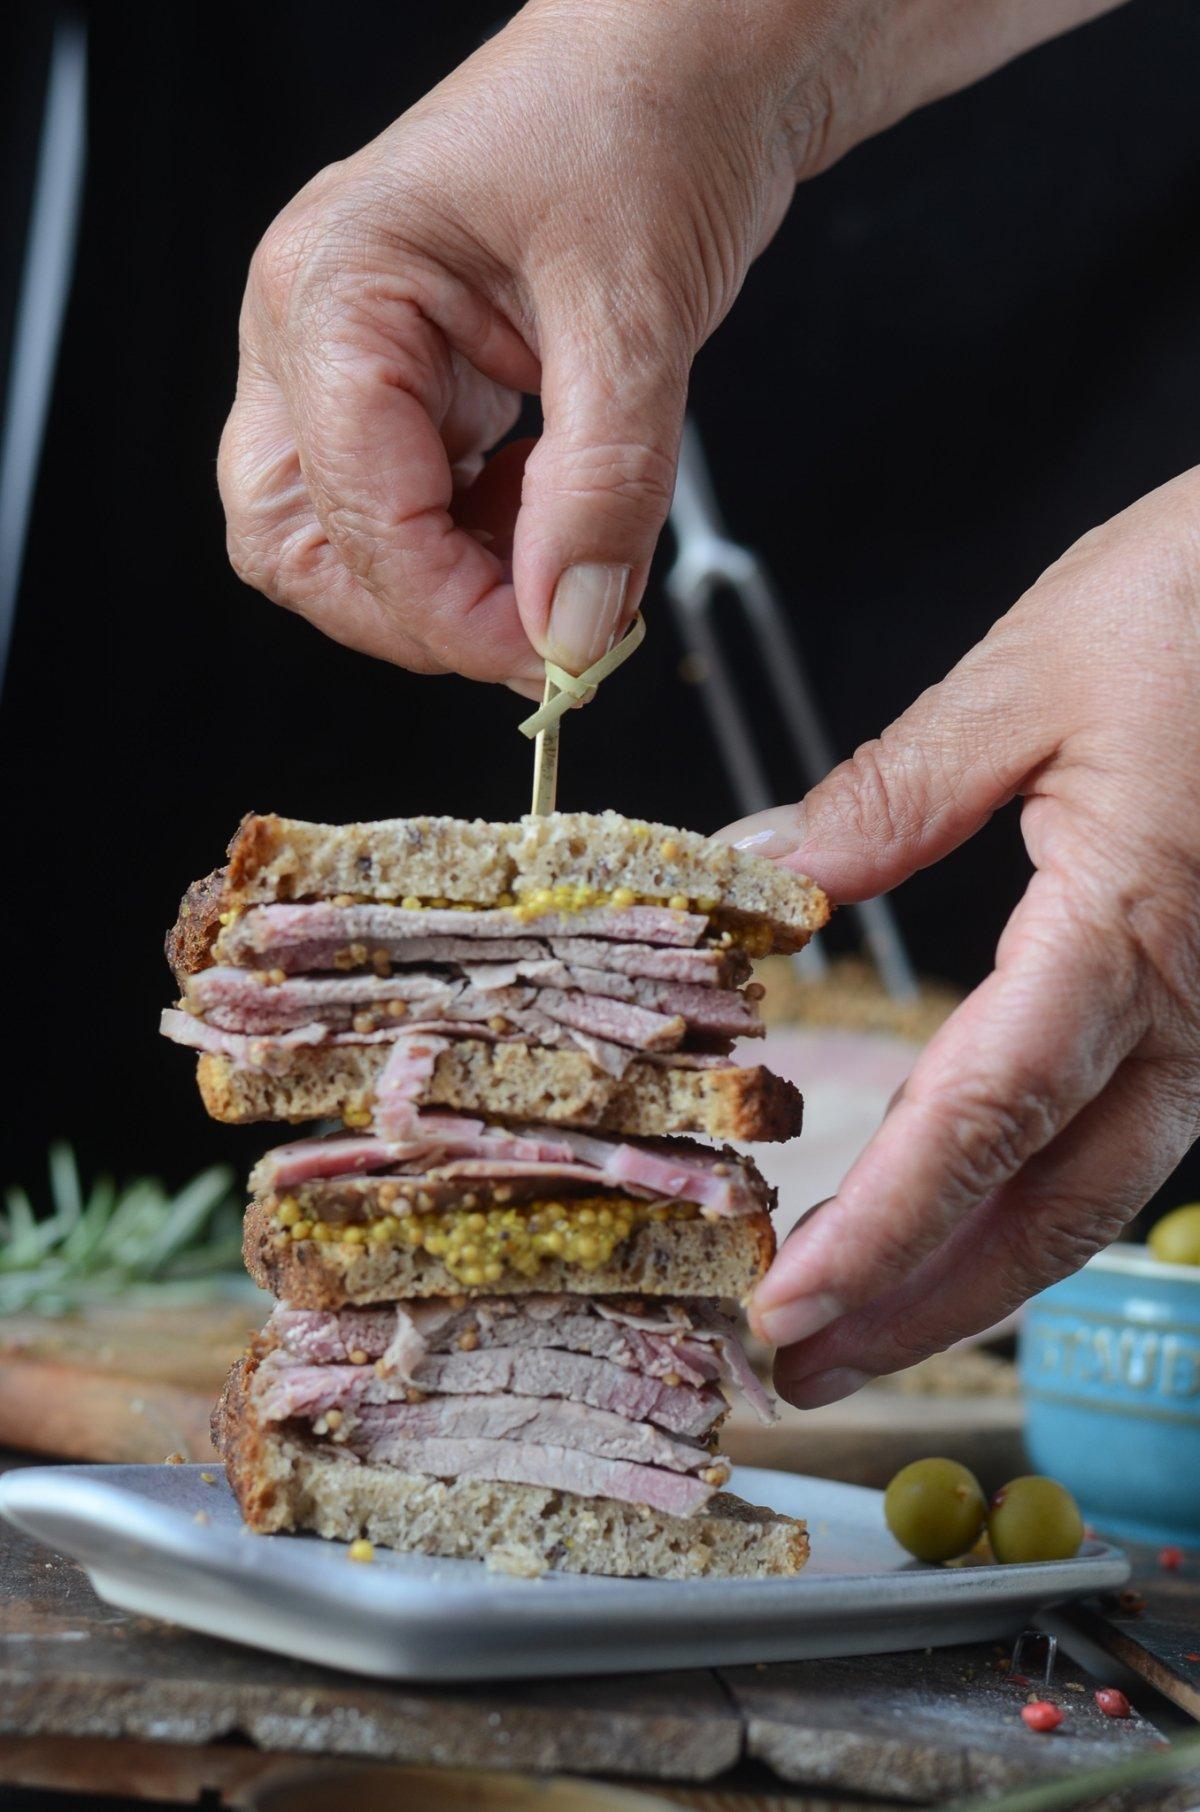 Sandwich de pastrami listo para degustar